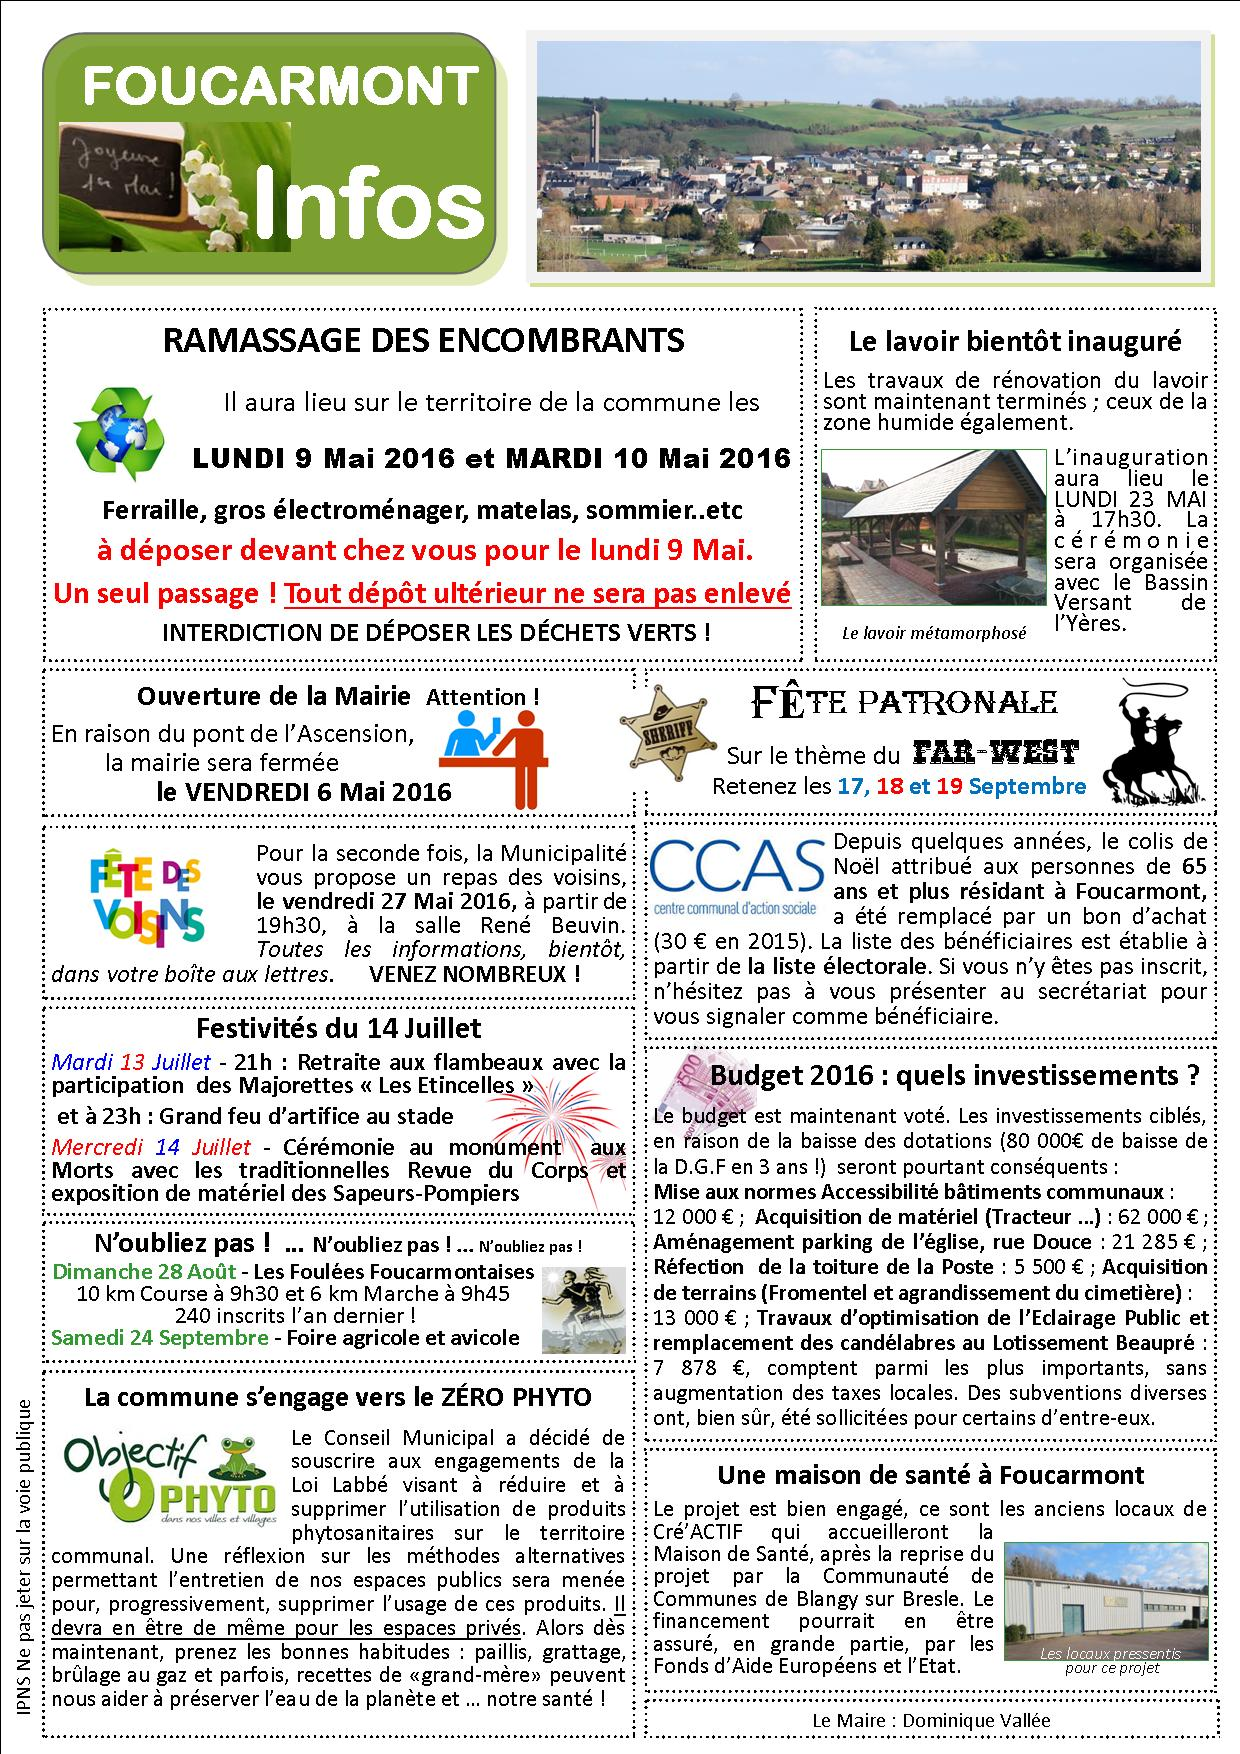 Foucarmont Infos 1 05 2016